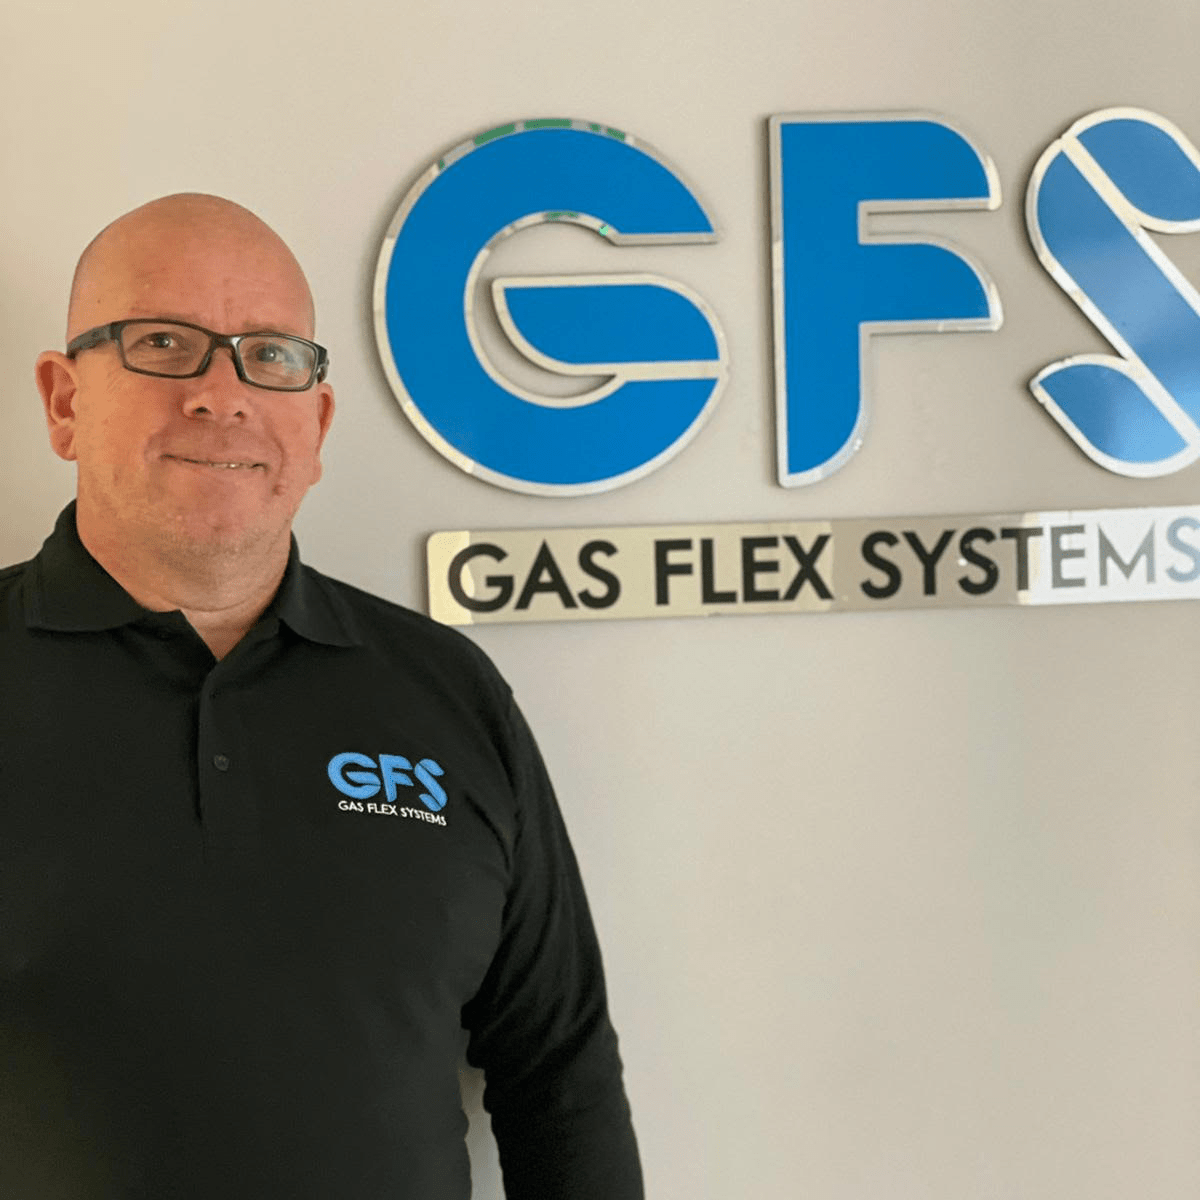 GFS CSST expert Andy Carpenter joins GFM